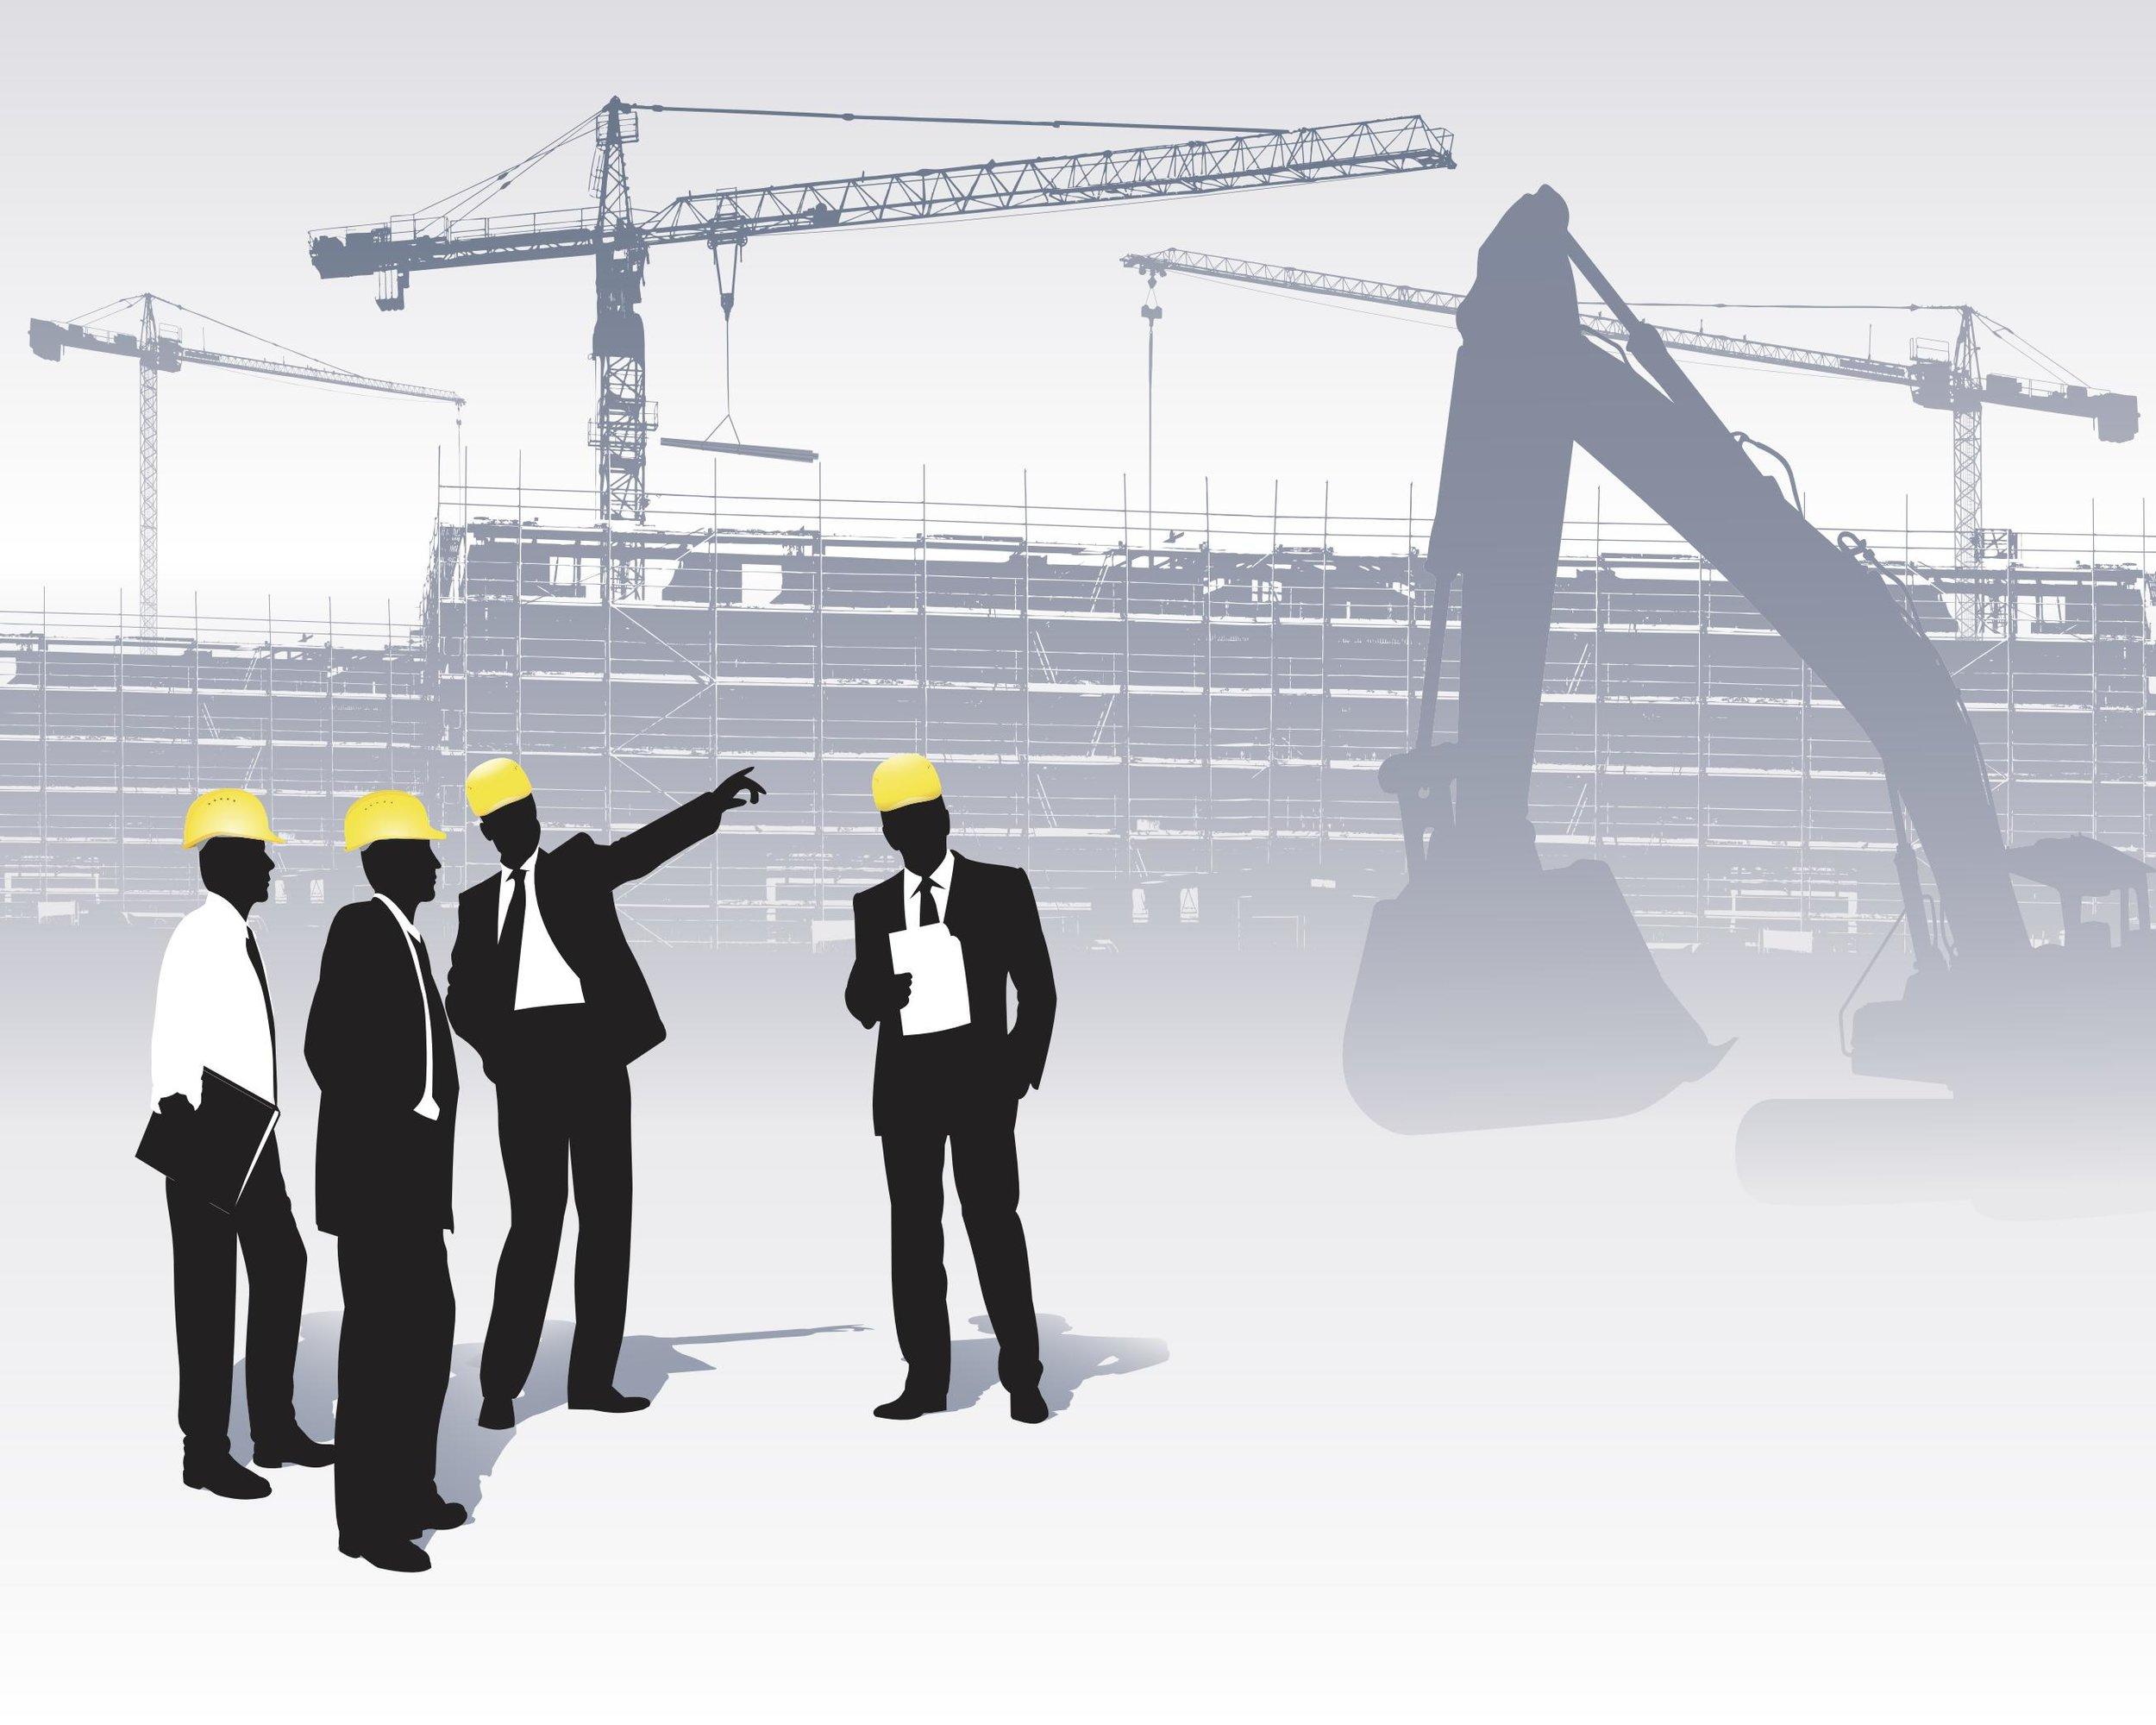 Business-People-Silhouette-001.jpg